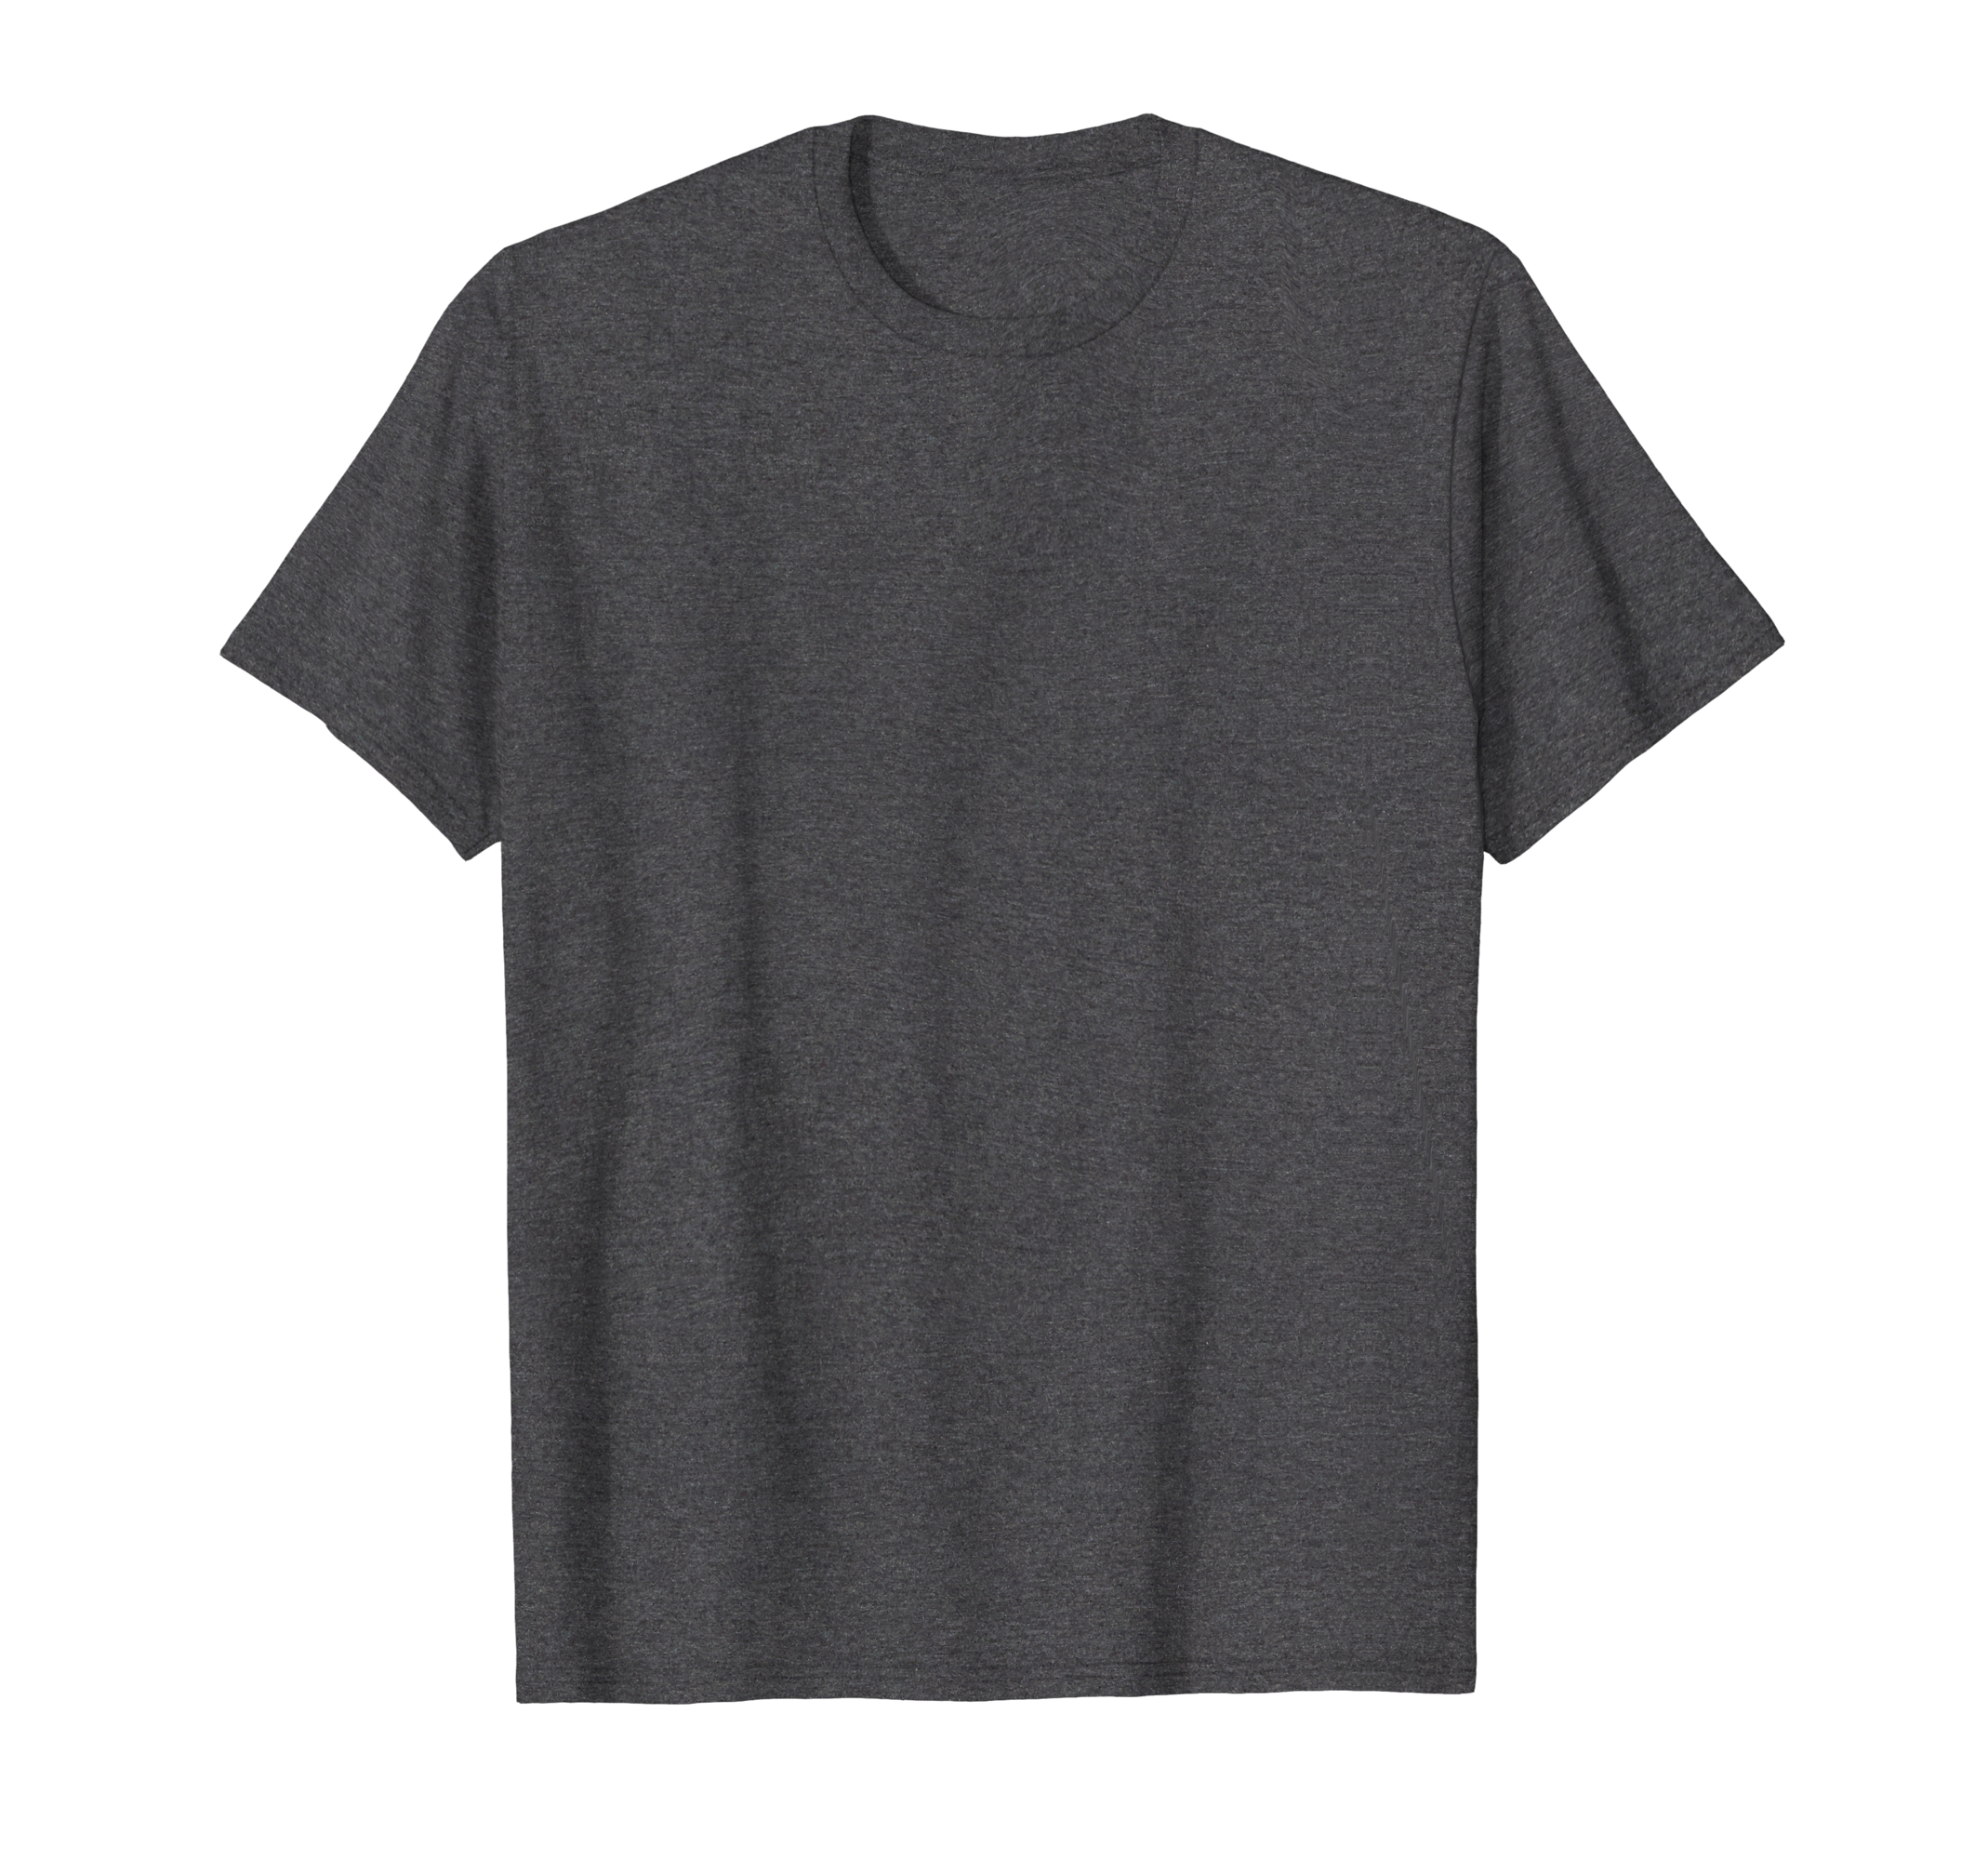 FART NOW LOADING Mens T-Shirt S-3XL Black//White Printed Funny Rude Joke Top